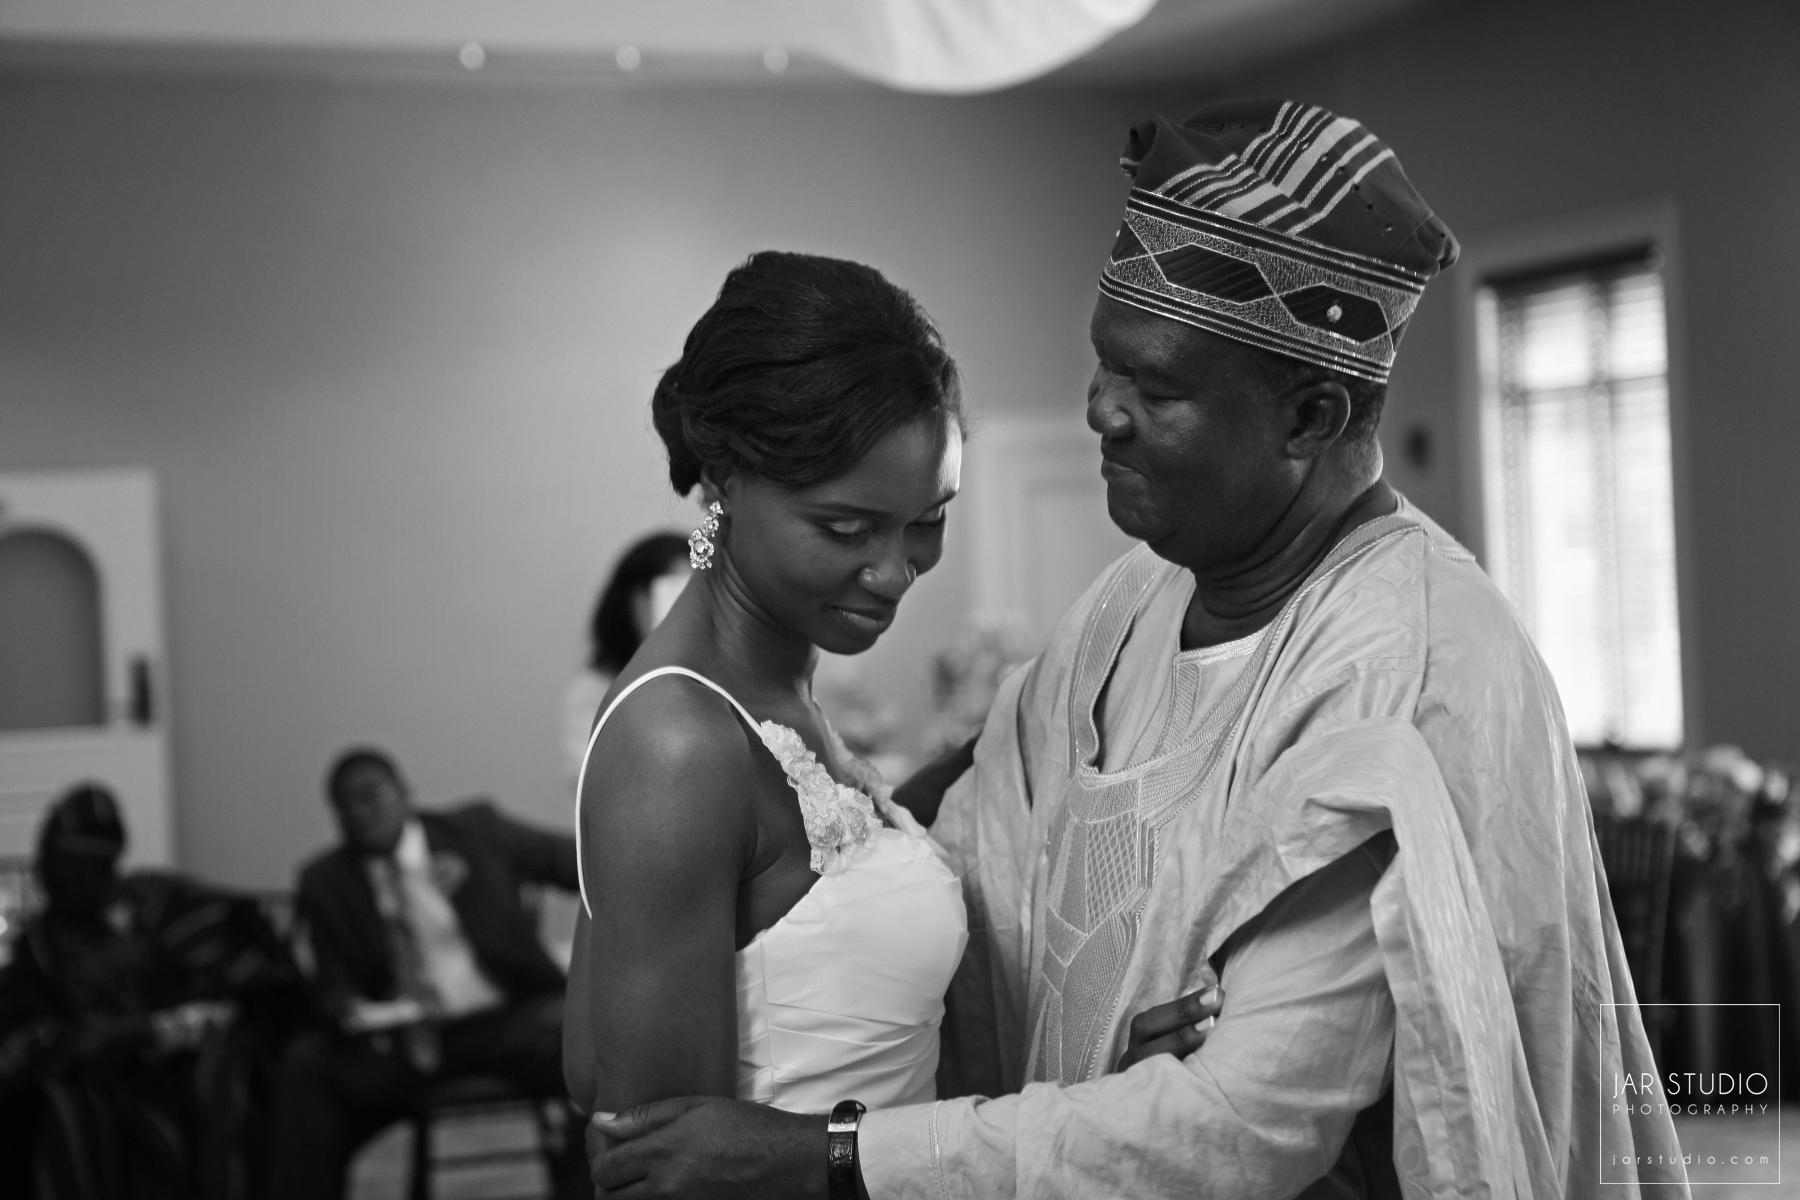 35-nigerian-traditional-father-bride-wedding-photographer-jarstudio.JPG